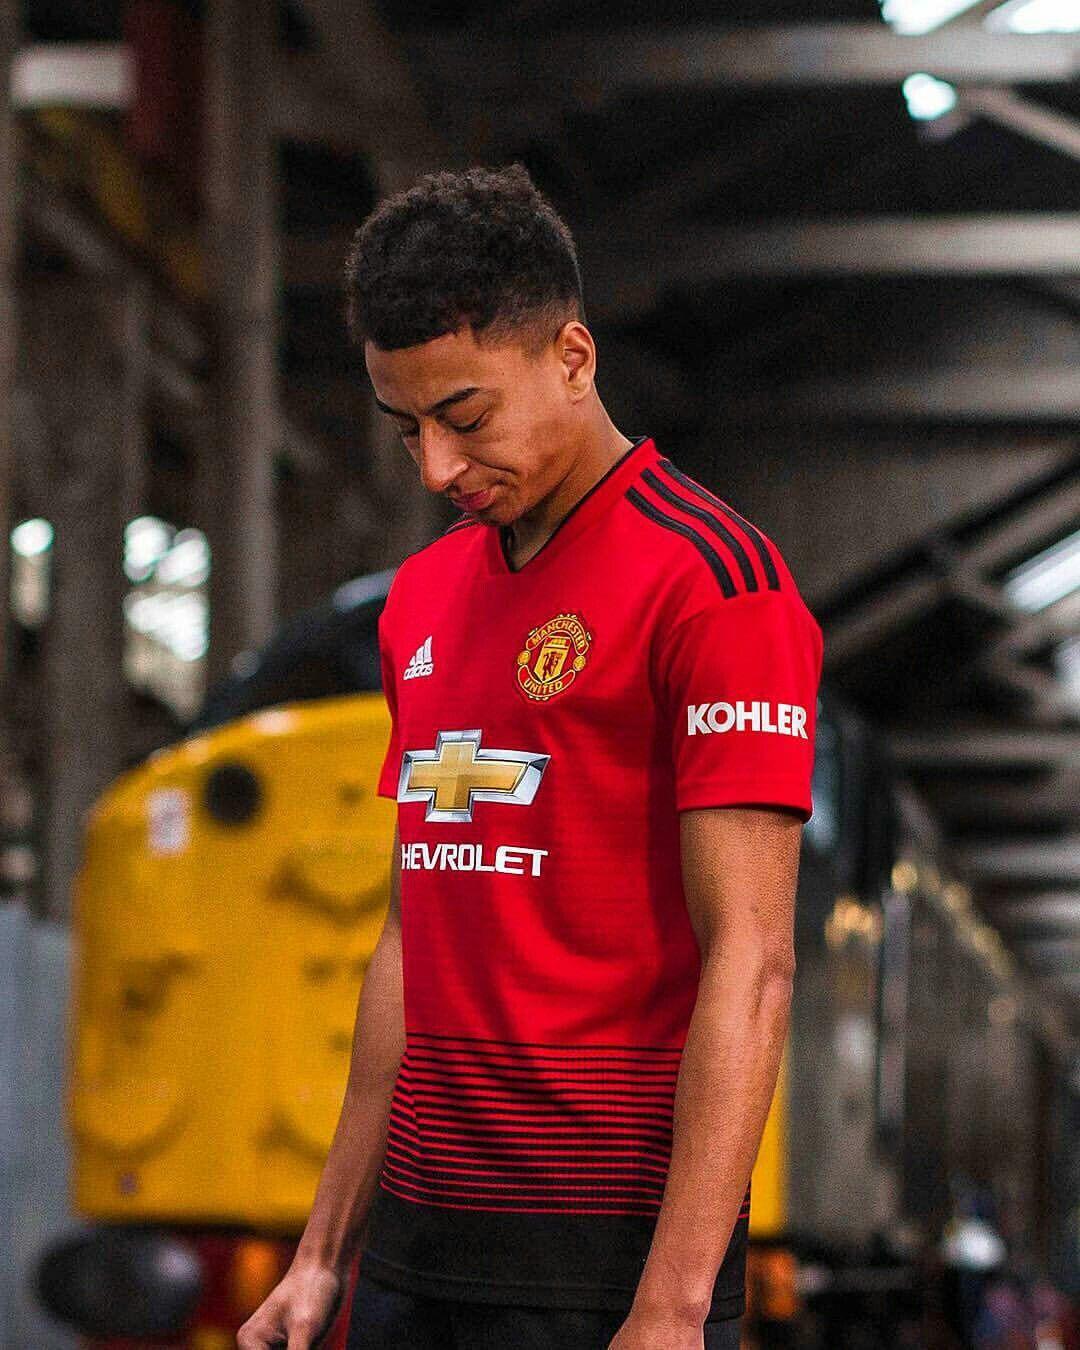 sports shoes 30c8c b4da2 Manchester United | Jesse Lingard | Manchester United ...